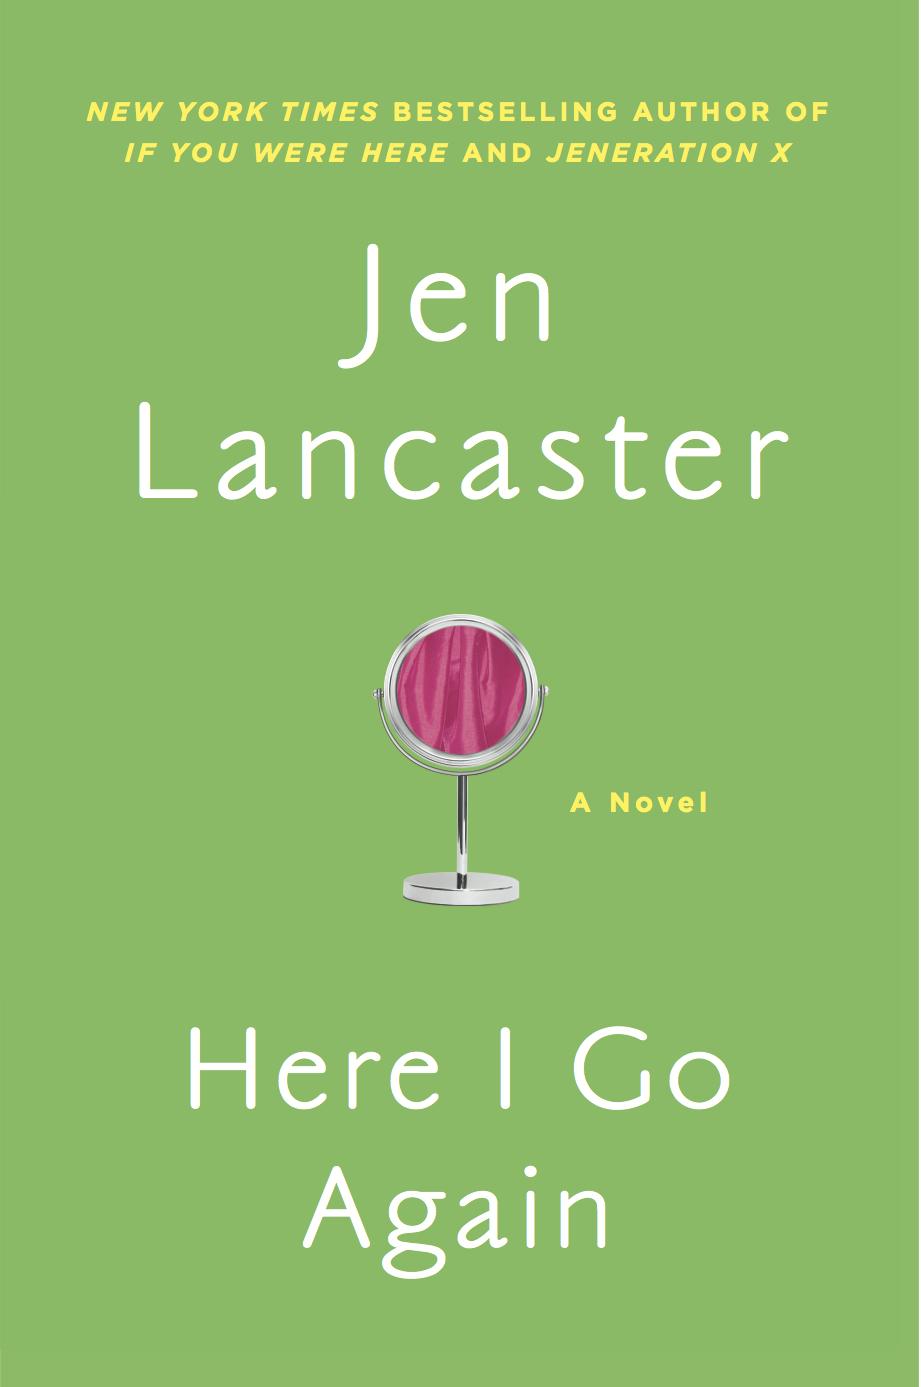 Here I Go Again by Jen Lancaster